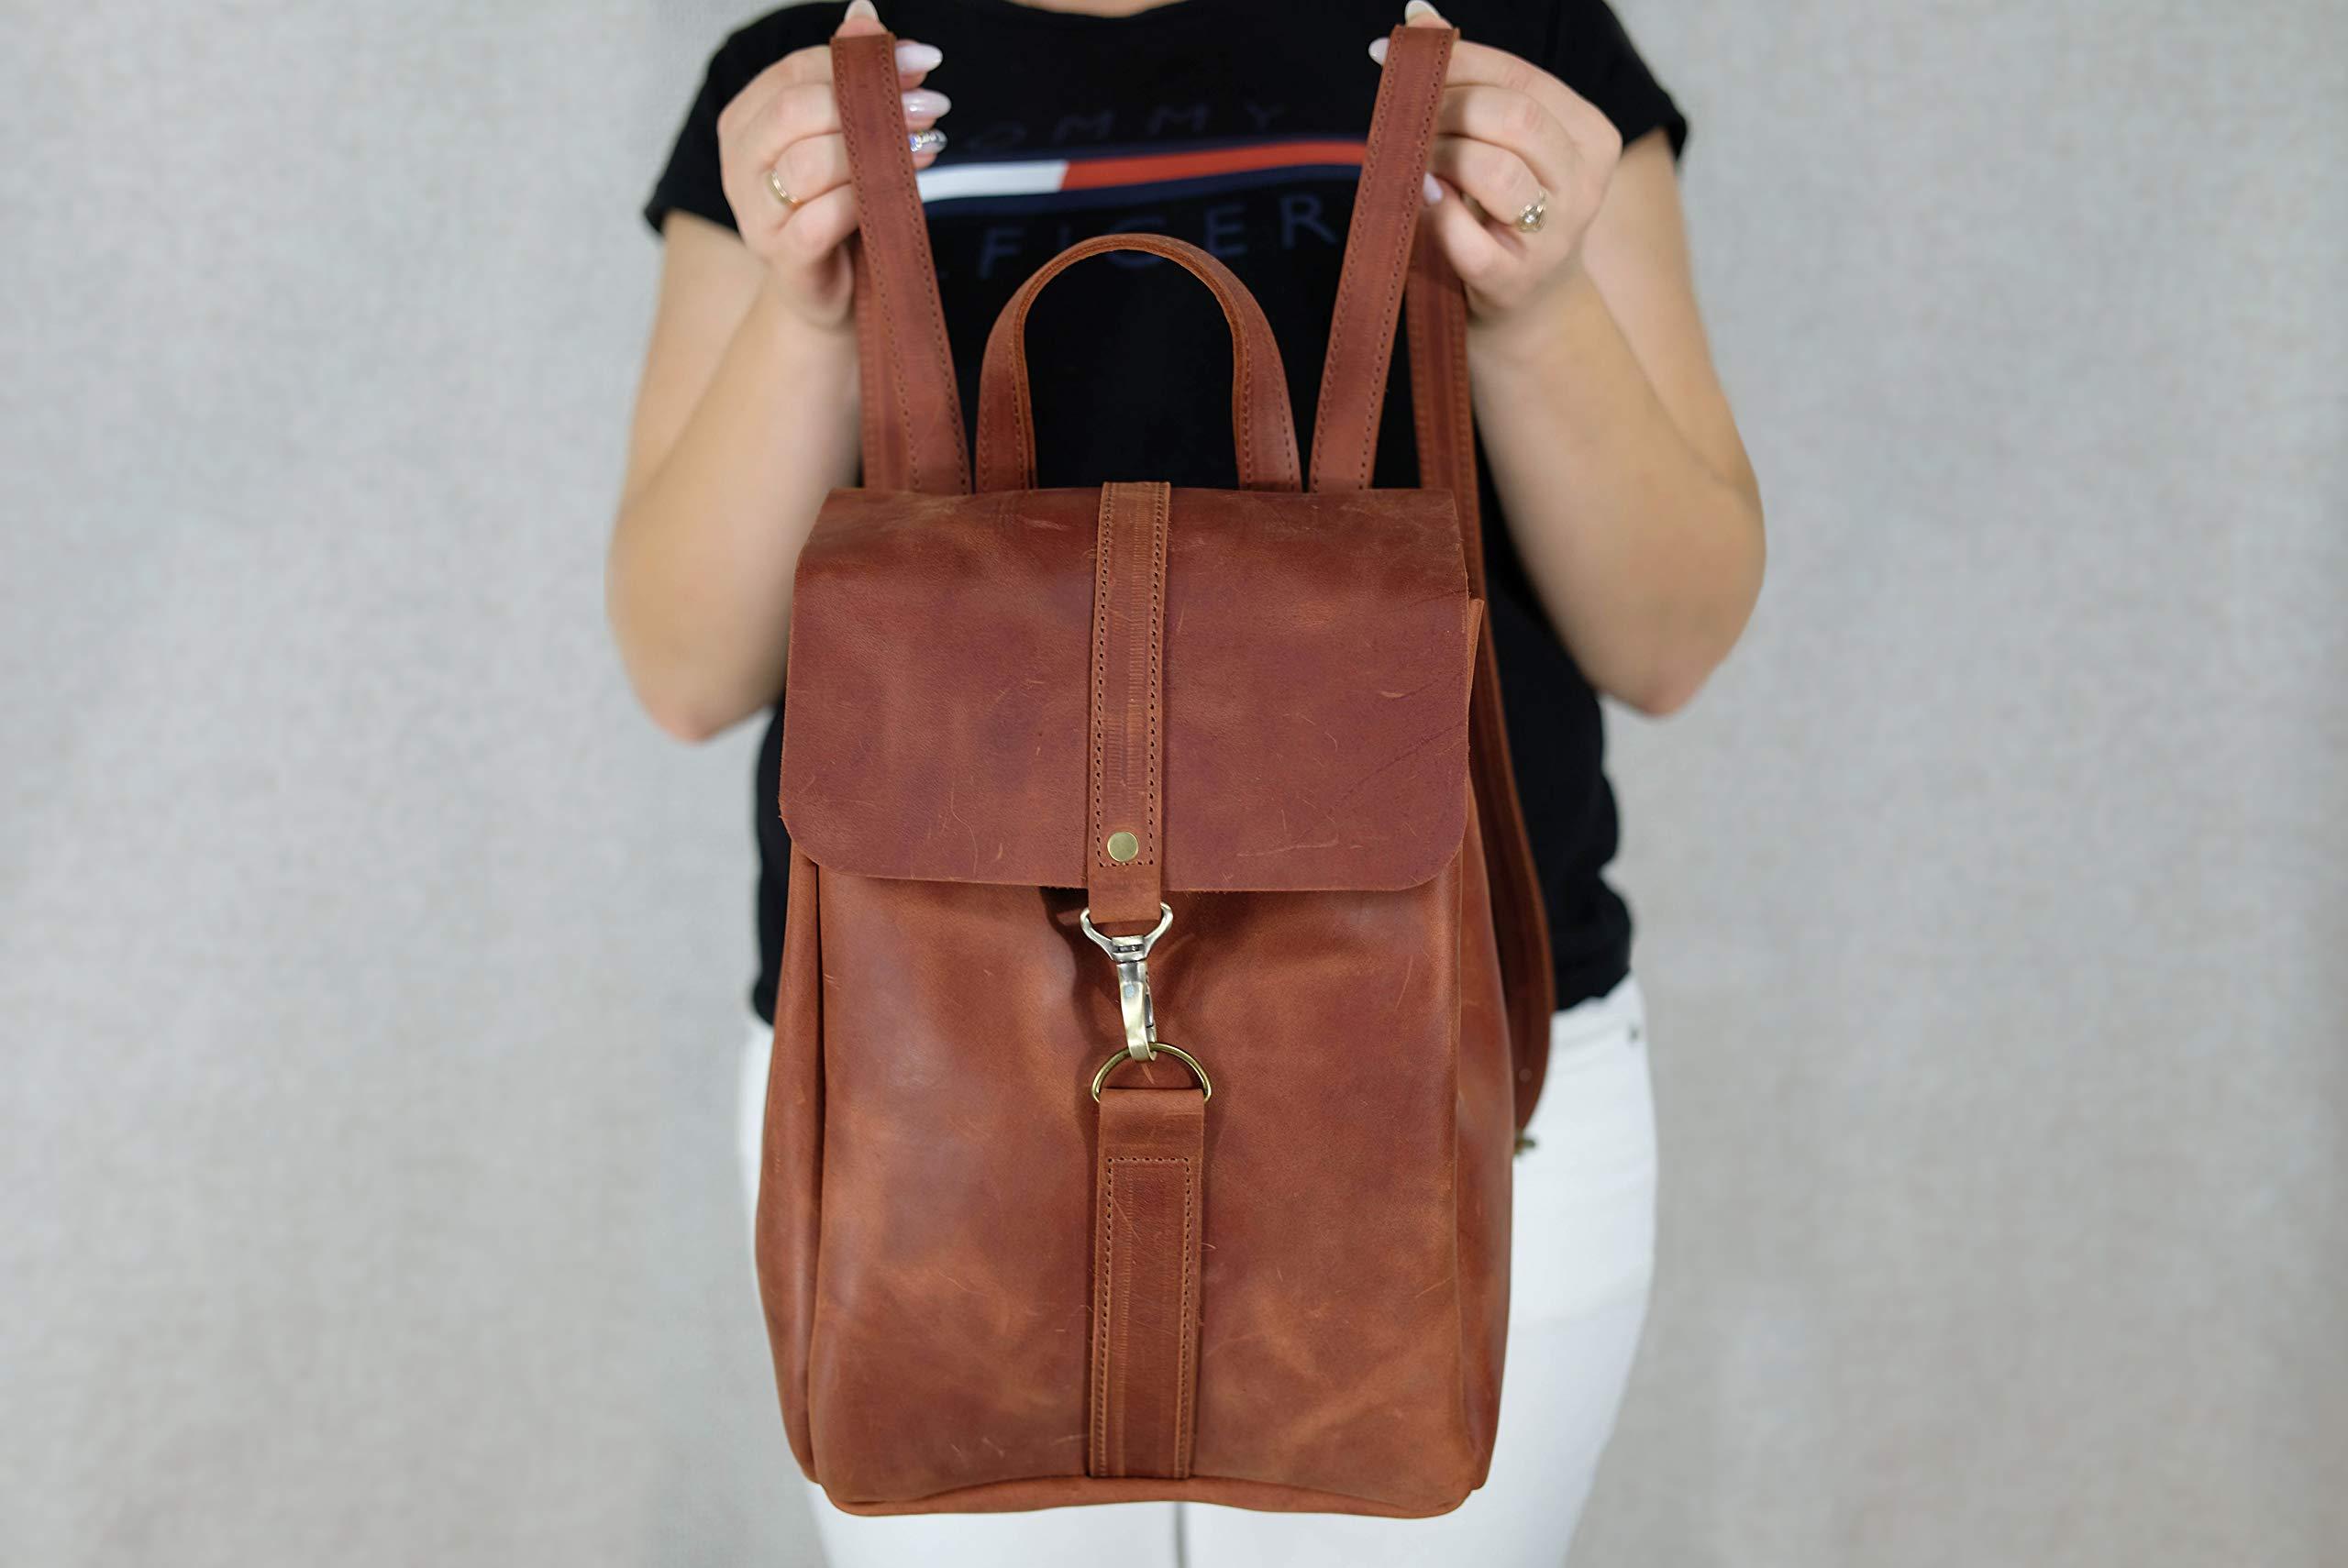 Leather backpack, Women backpack, Leather backpack women, Brown women backpack, Gift anniversary, Shoulder Bag, Monogram, Work, Handbag 9 x 12.6 inch